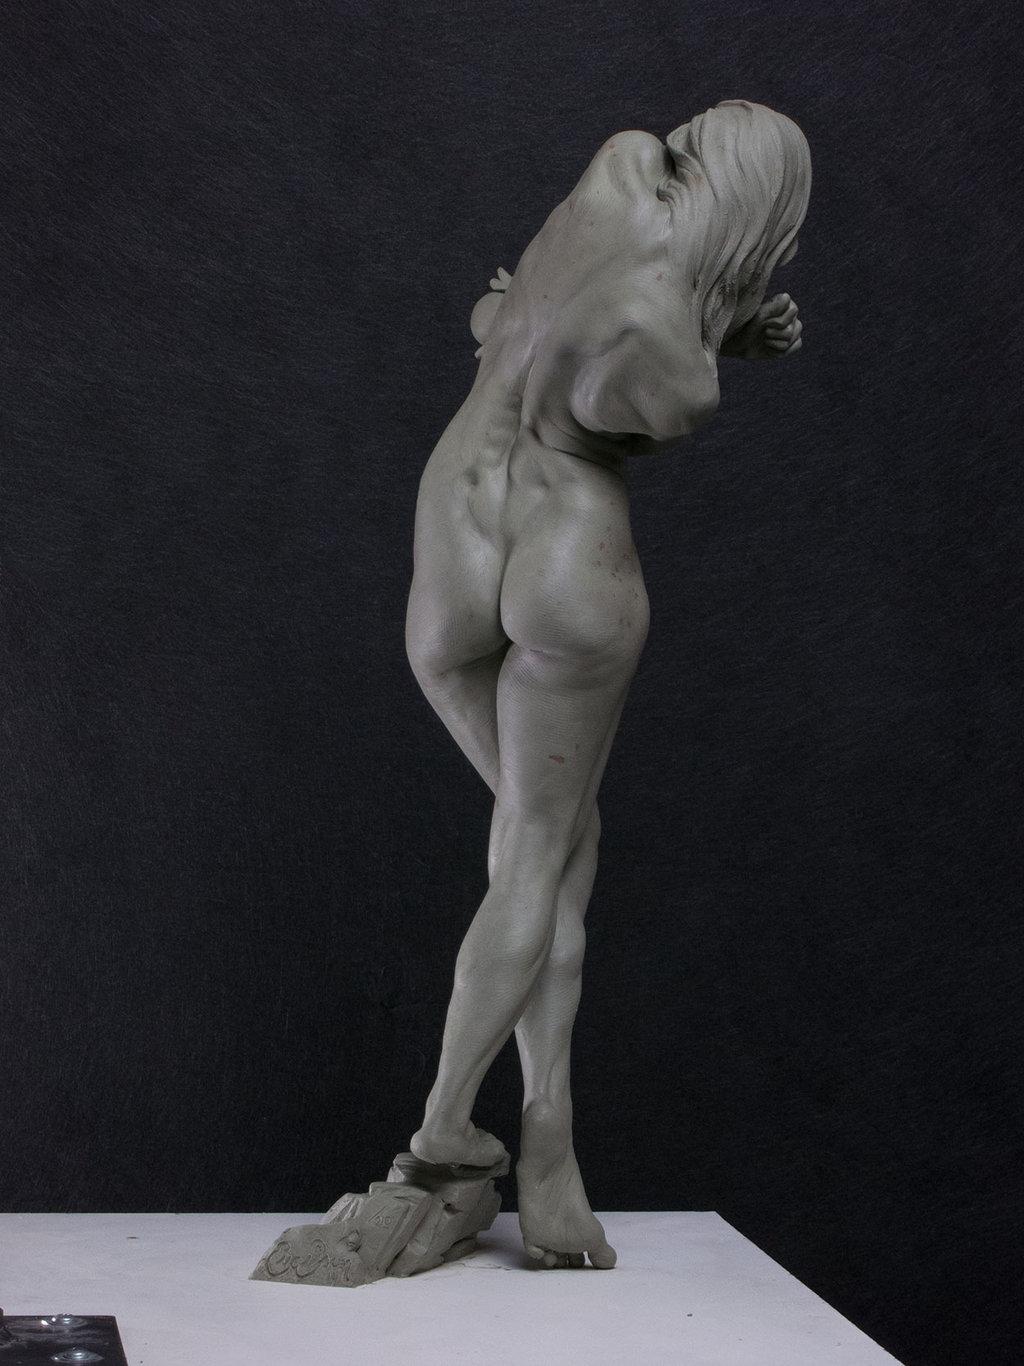 Скульптура голой девушки фото 28 фотография